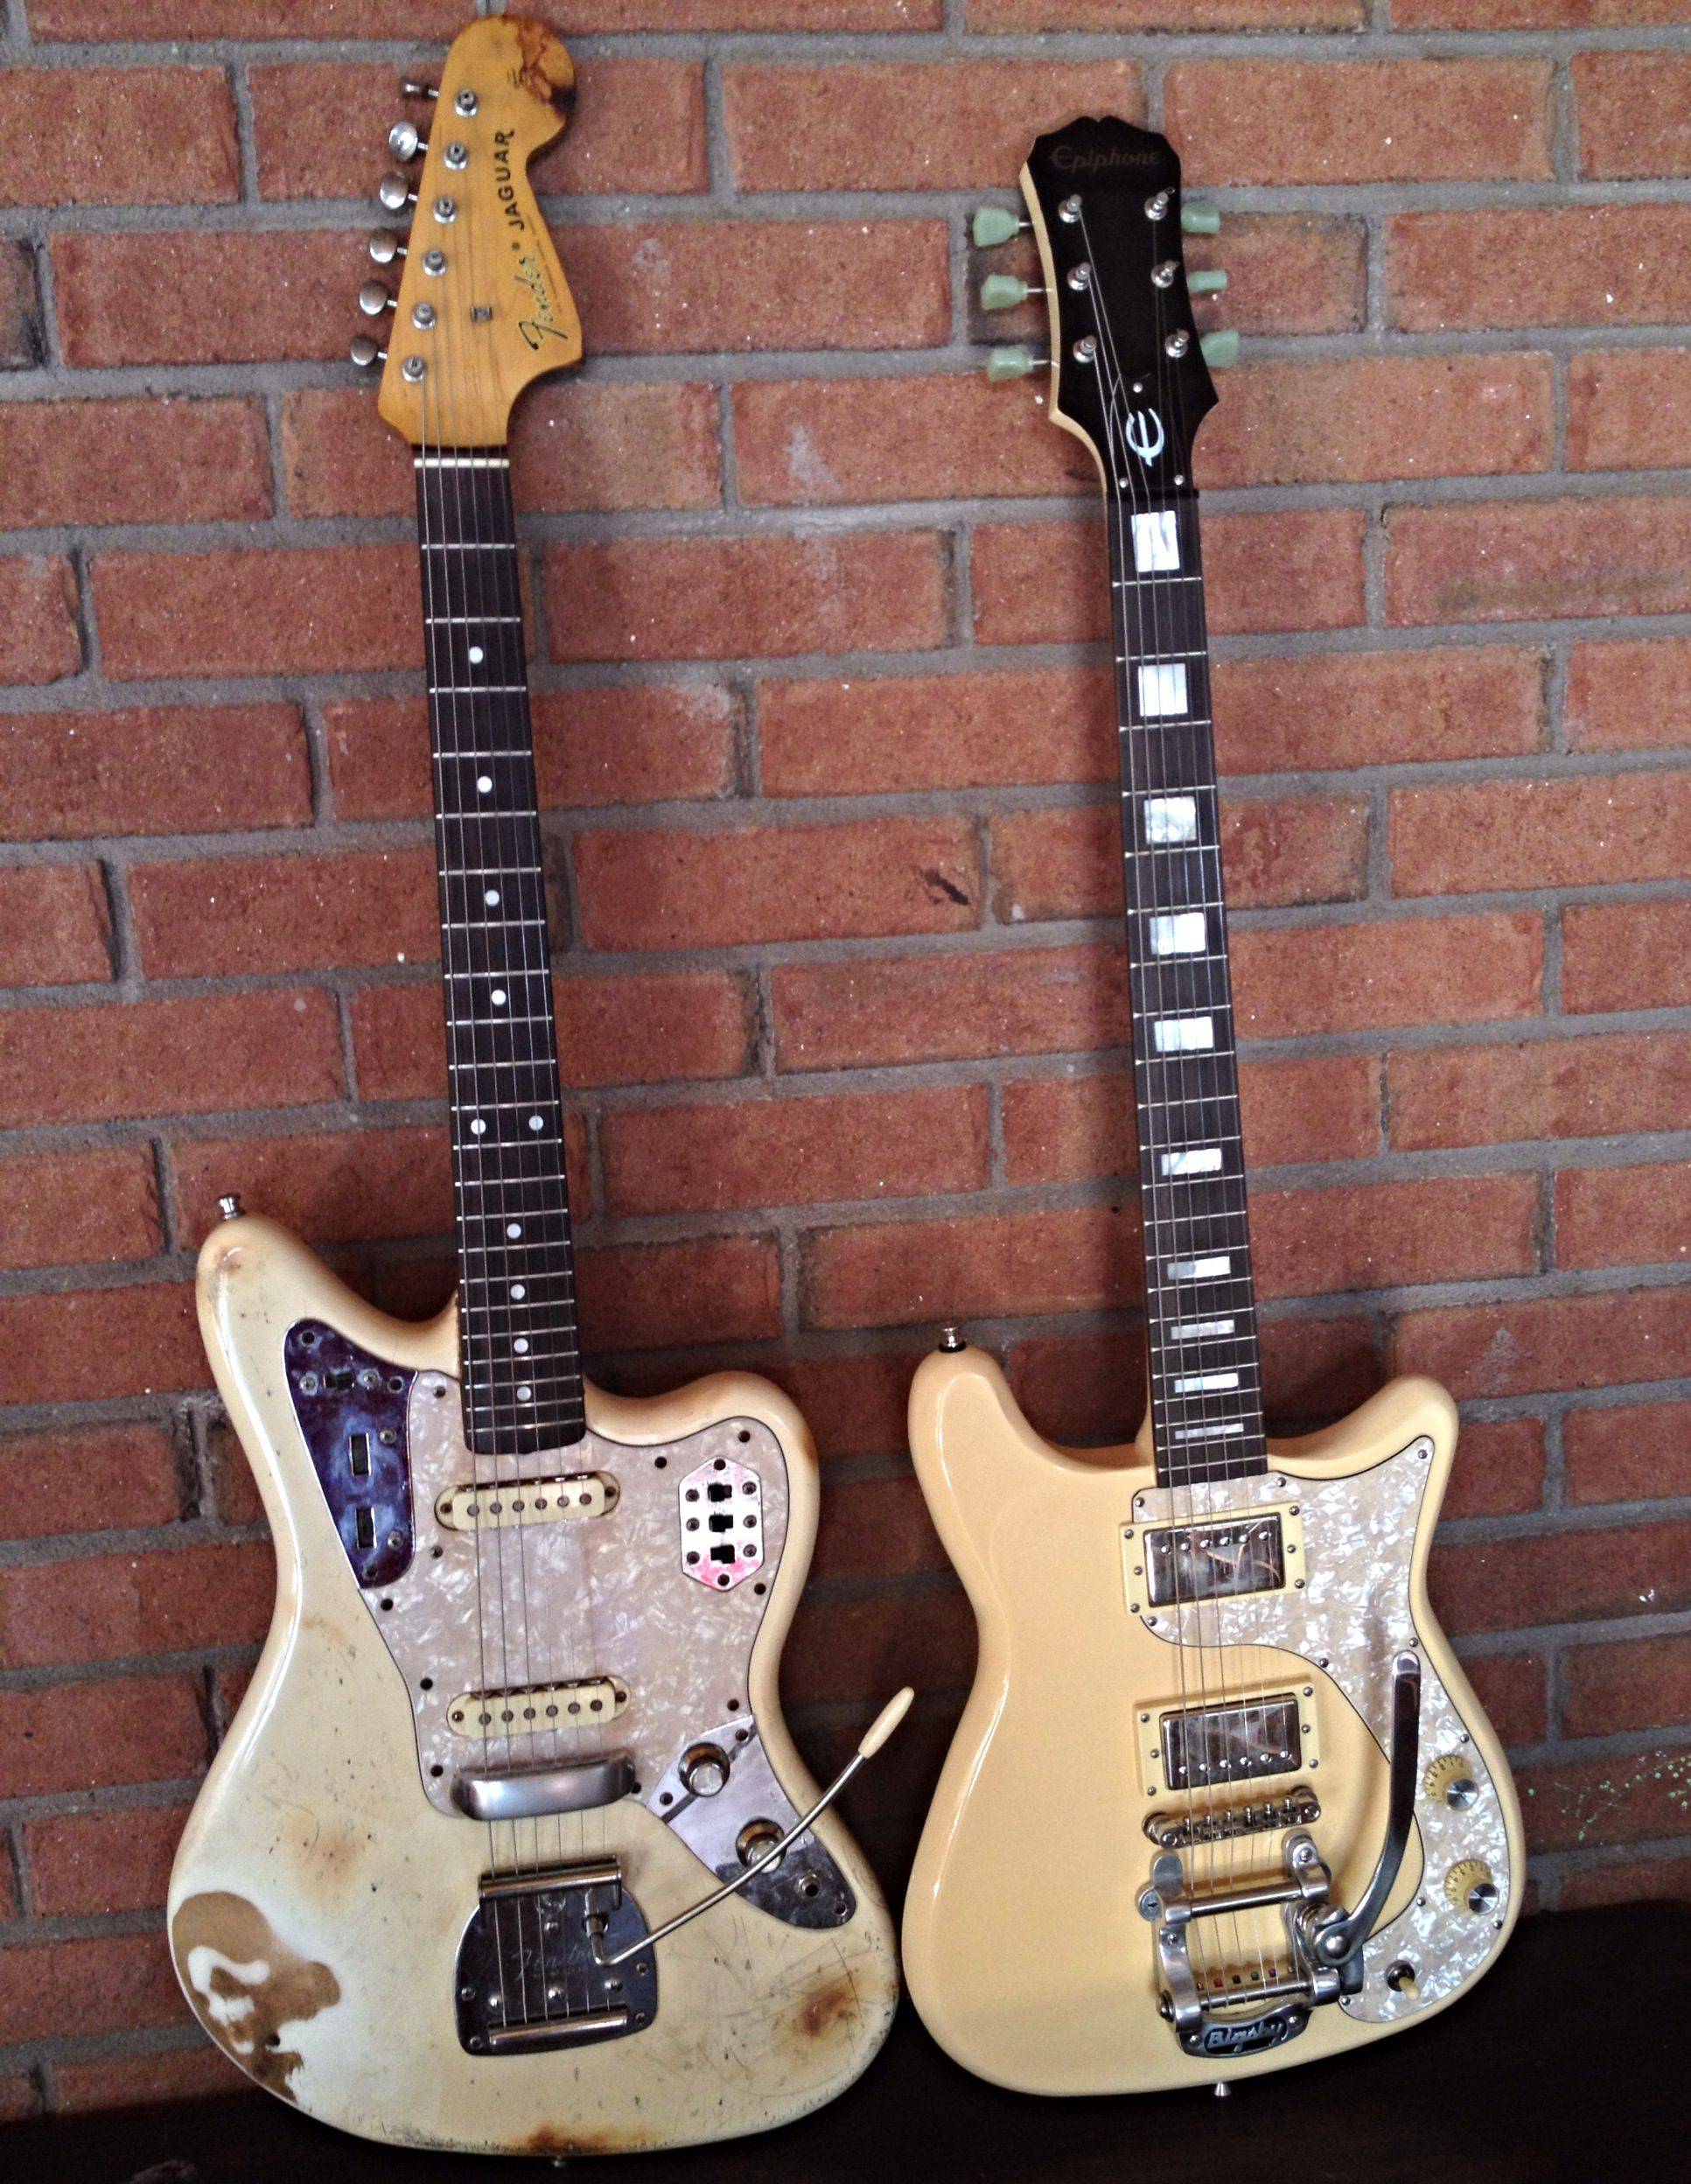 86 MIJ Jag and Epiphone Wilshire Phant-O-Matic    Guitars